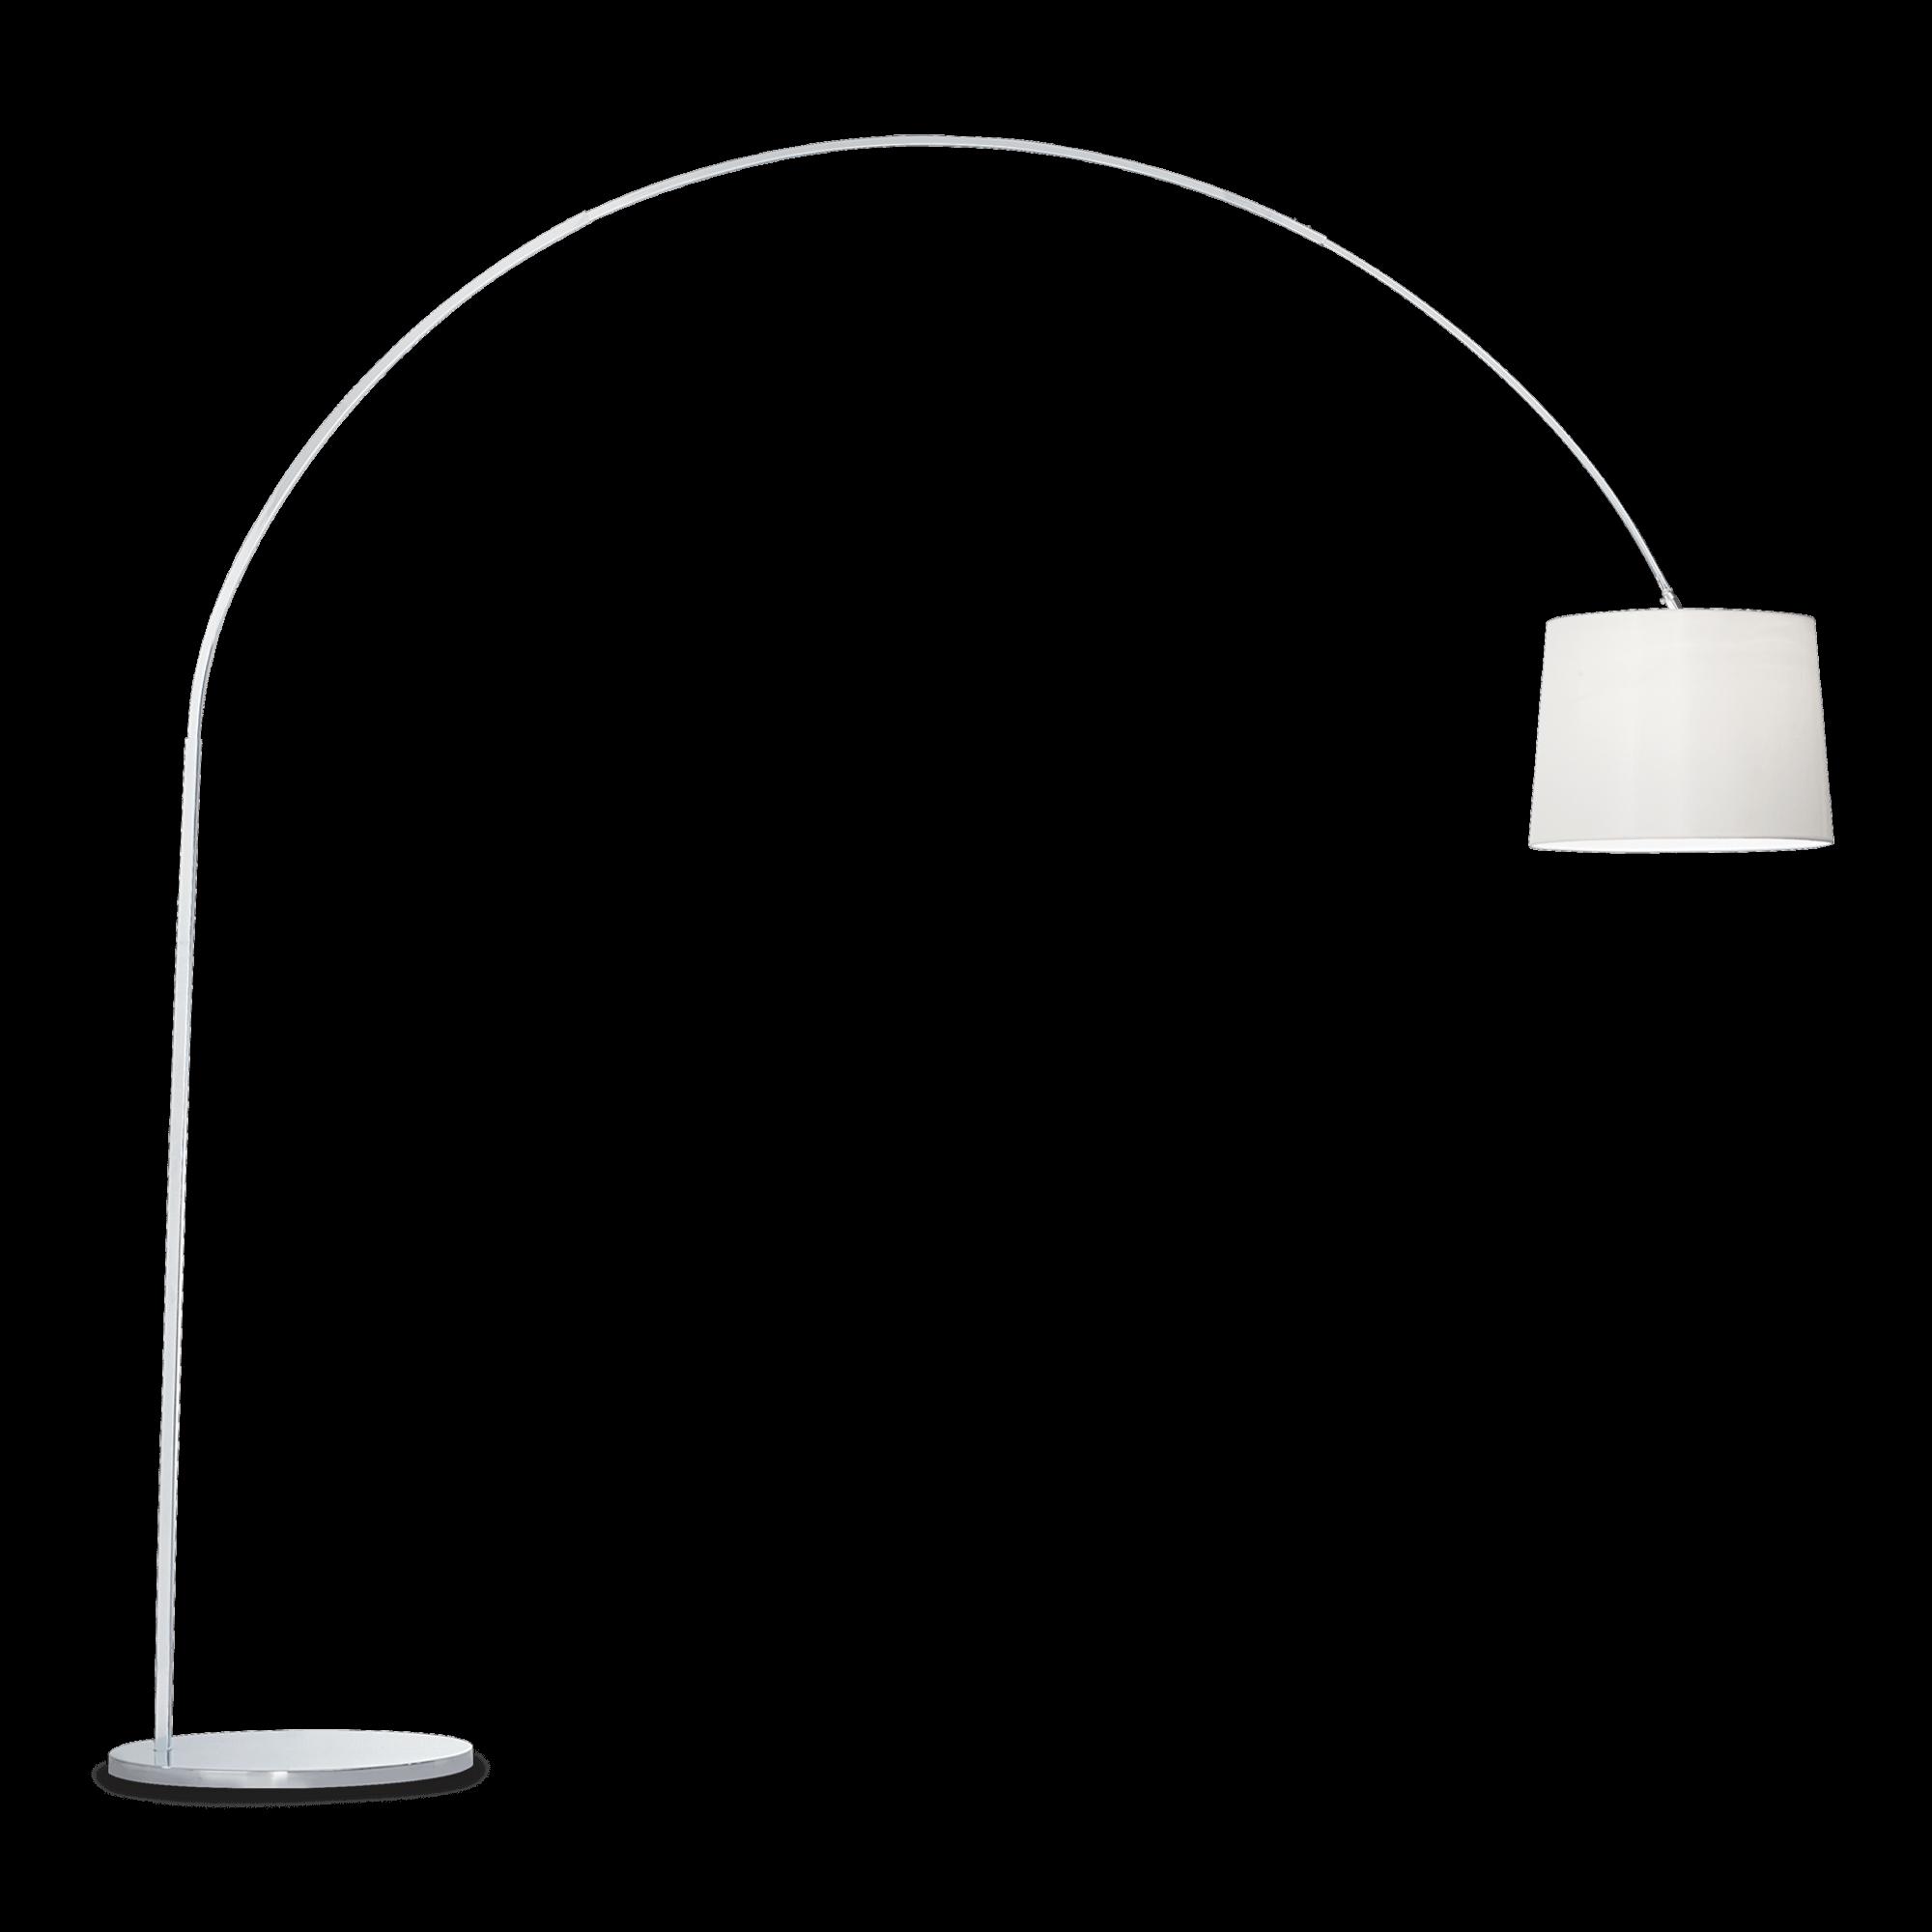 Ideal Lux 012605 Dorsale PT1 Bianco állólámpa